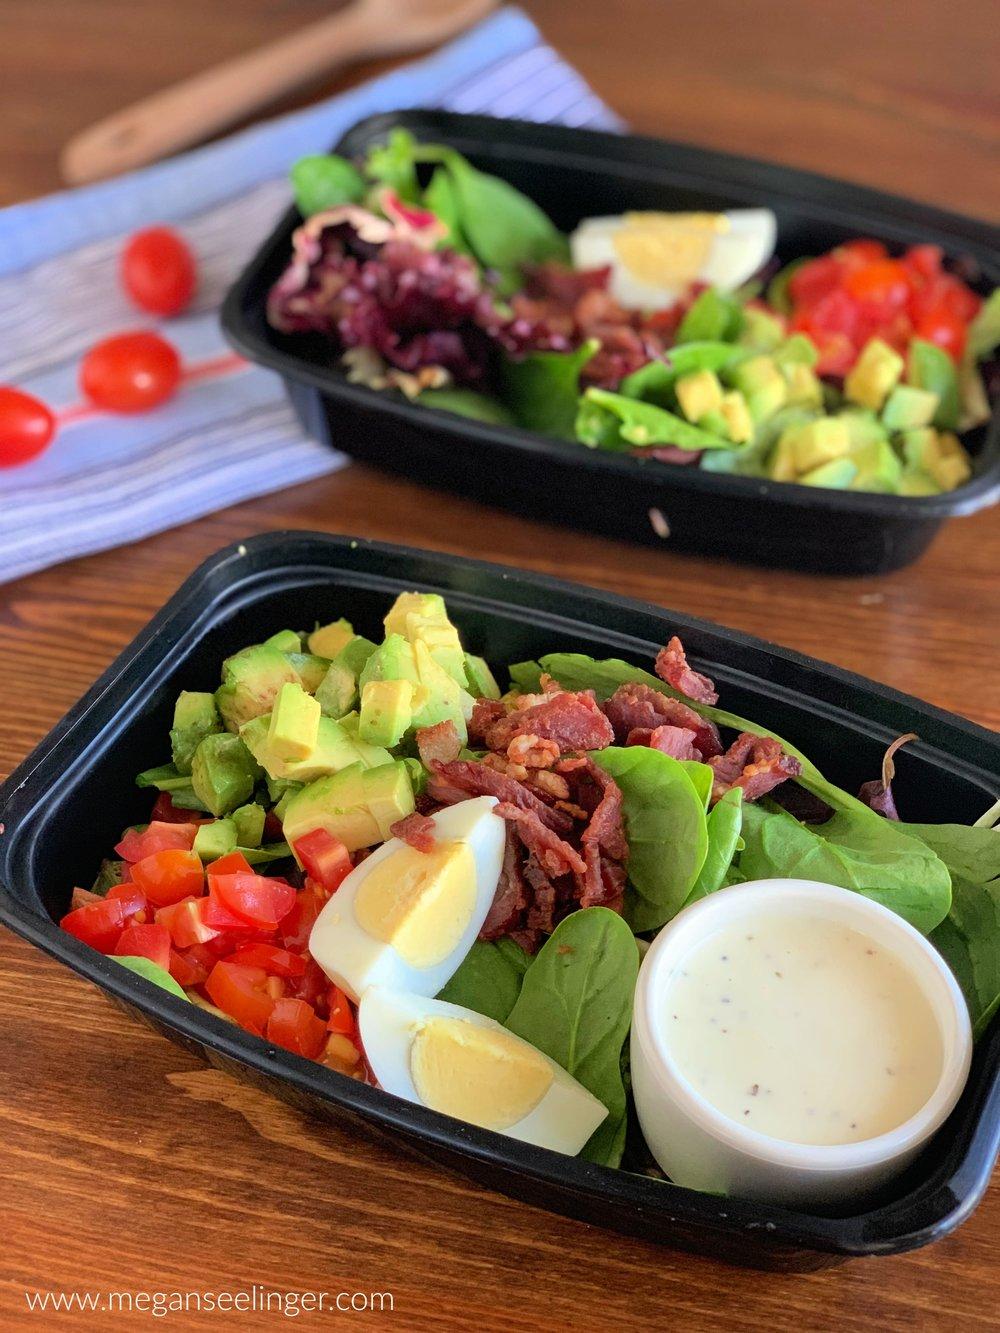 Keto Cobb Salad Recipe - Easy Low Carb Lunch Idea